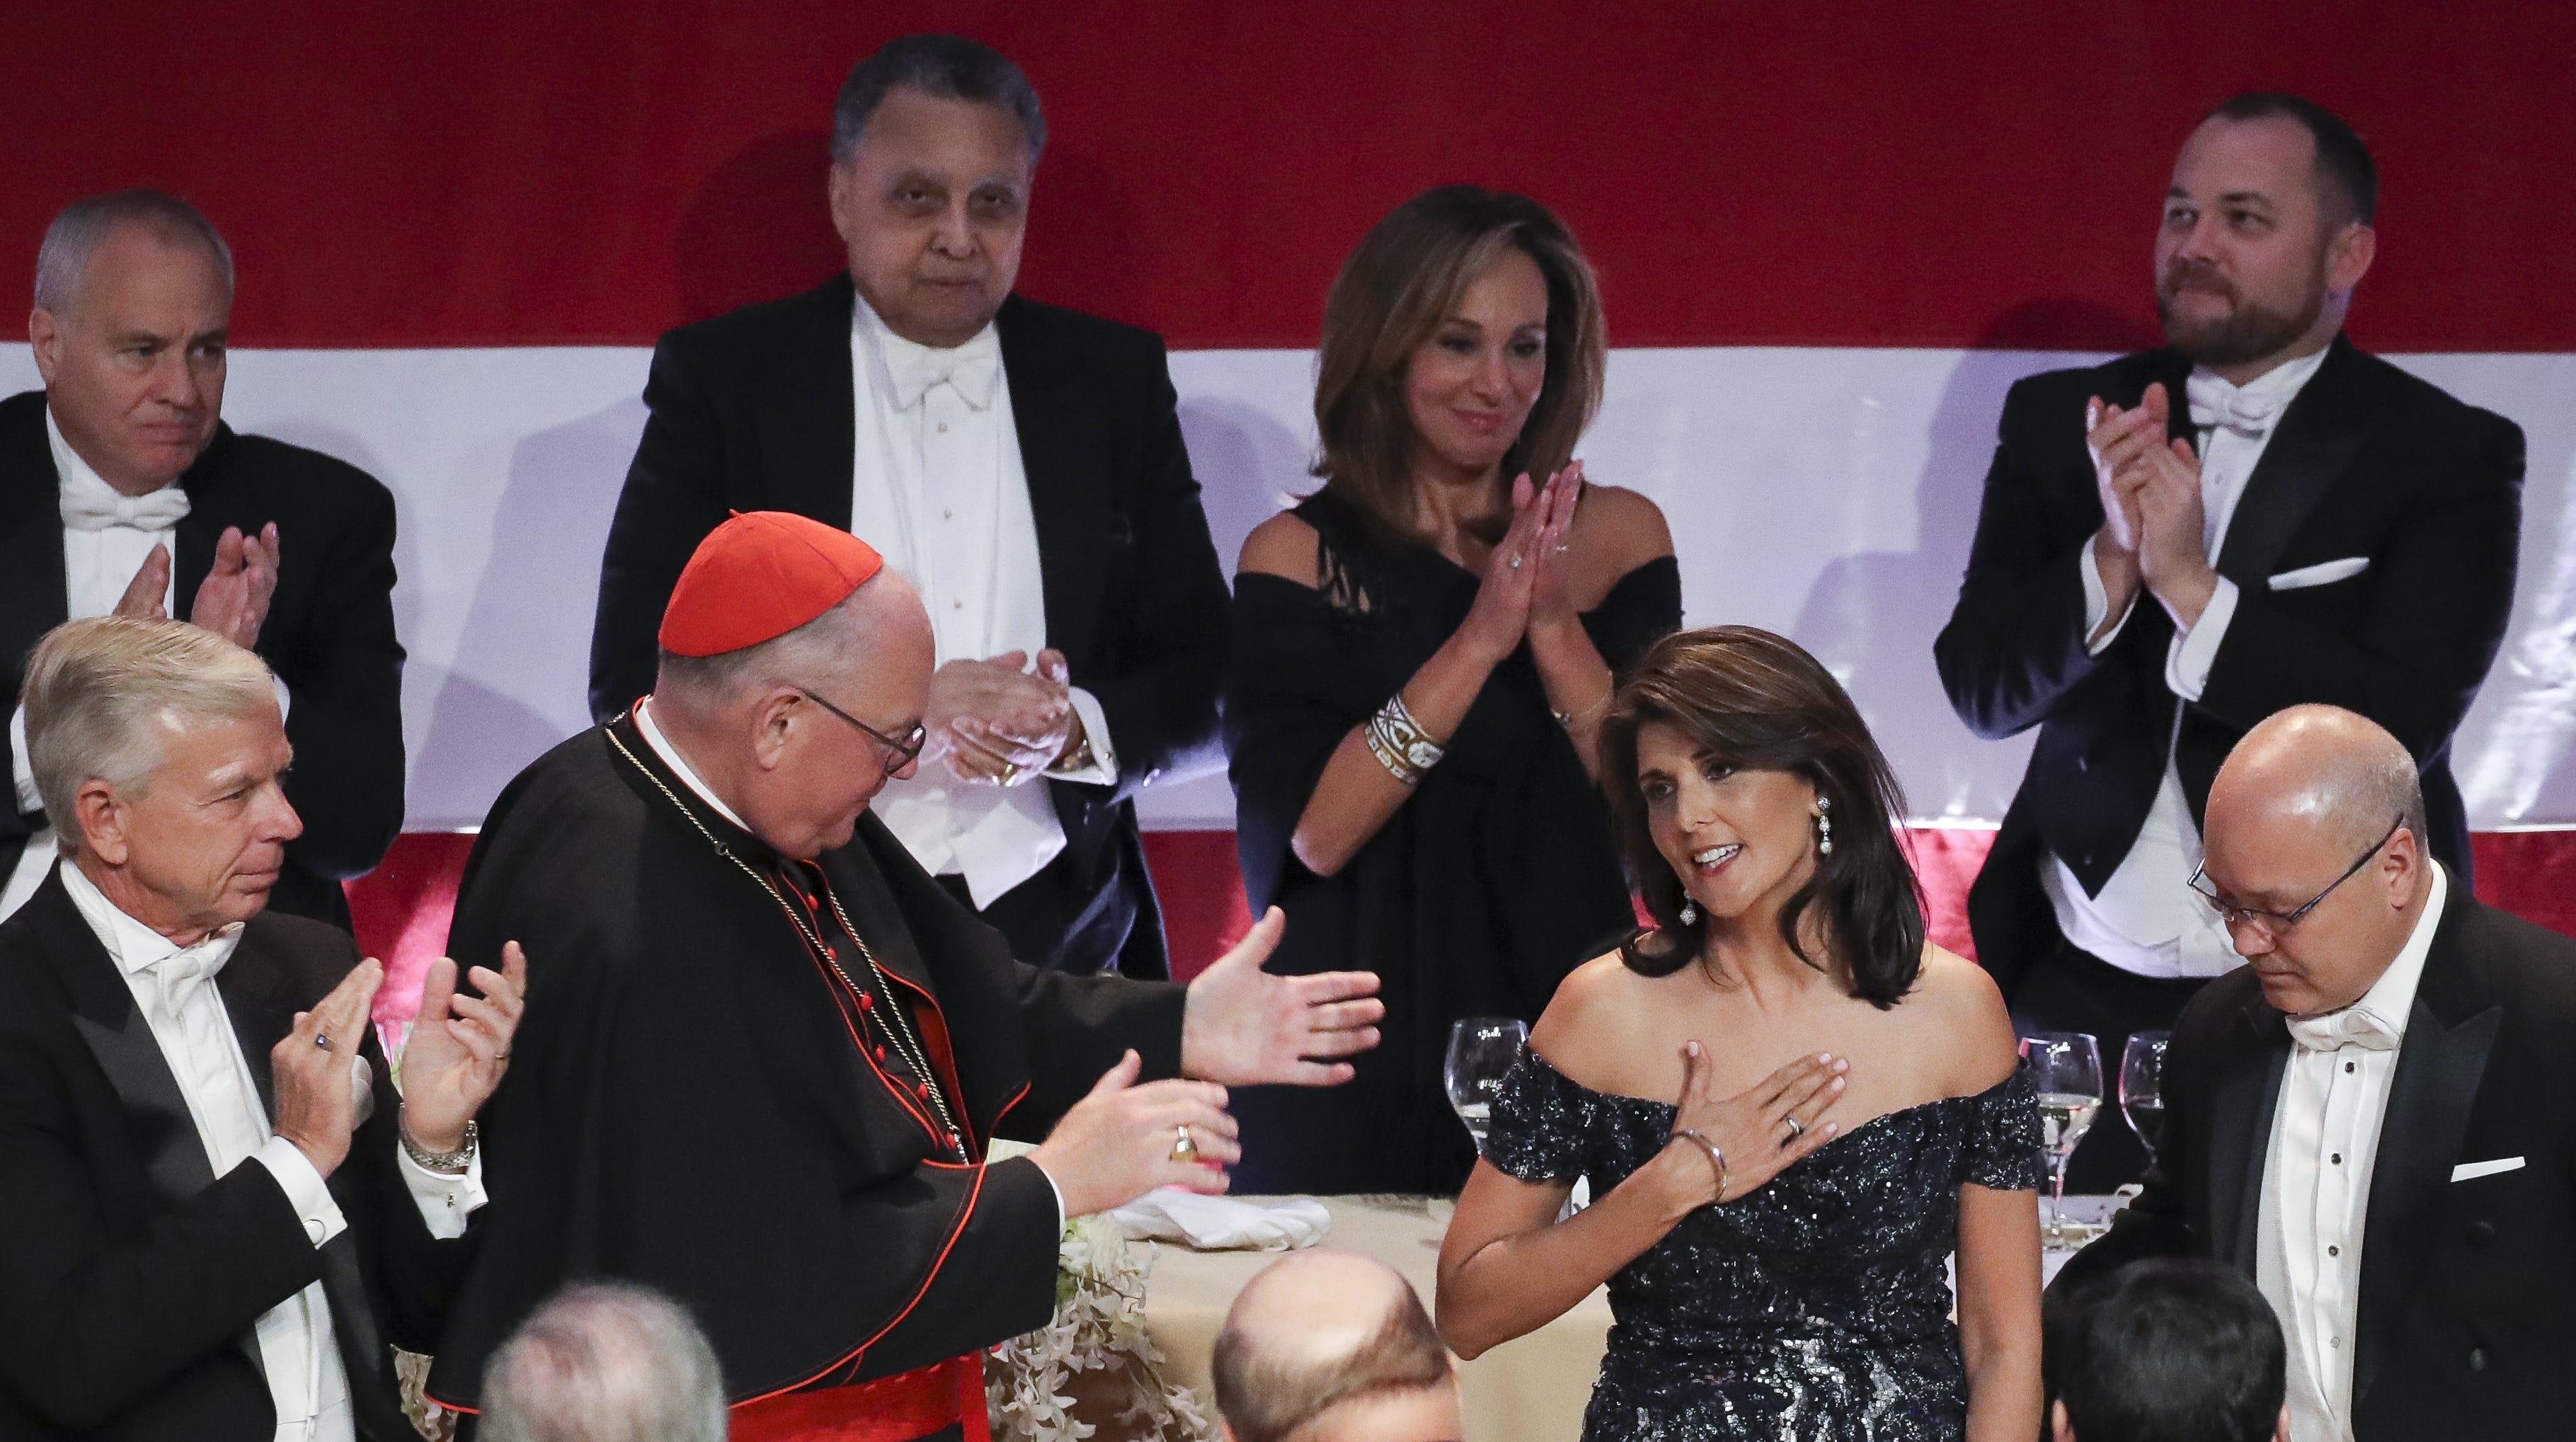 Nikki Haley pokes fun at her Indian roots — and Elizabeth Warren's